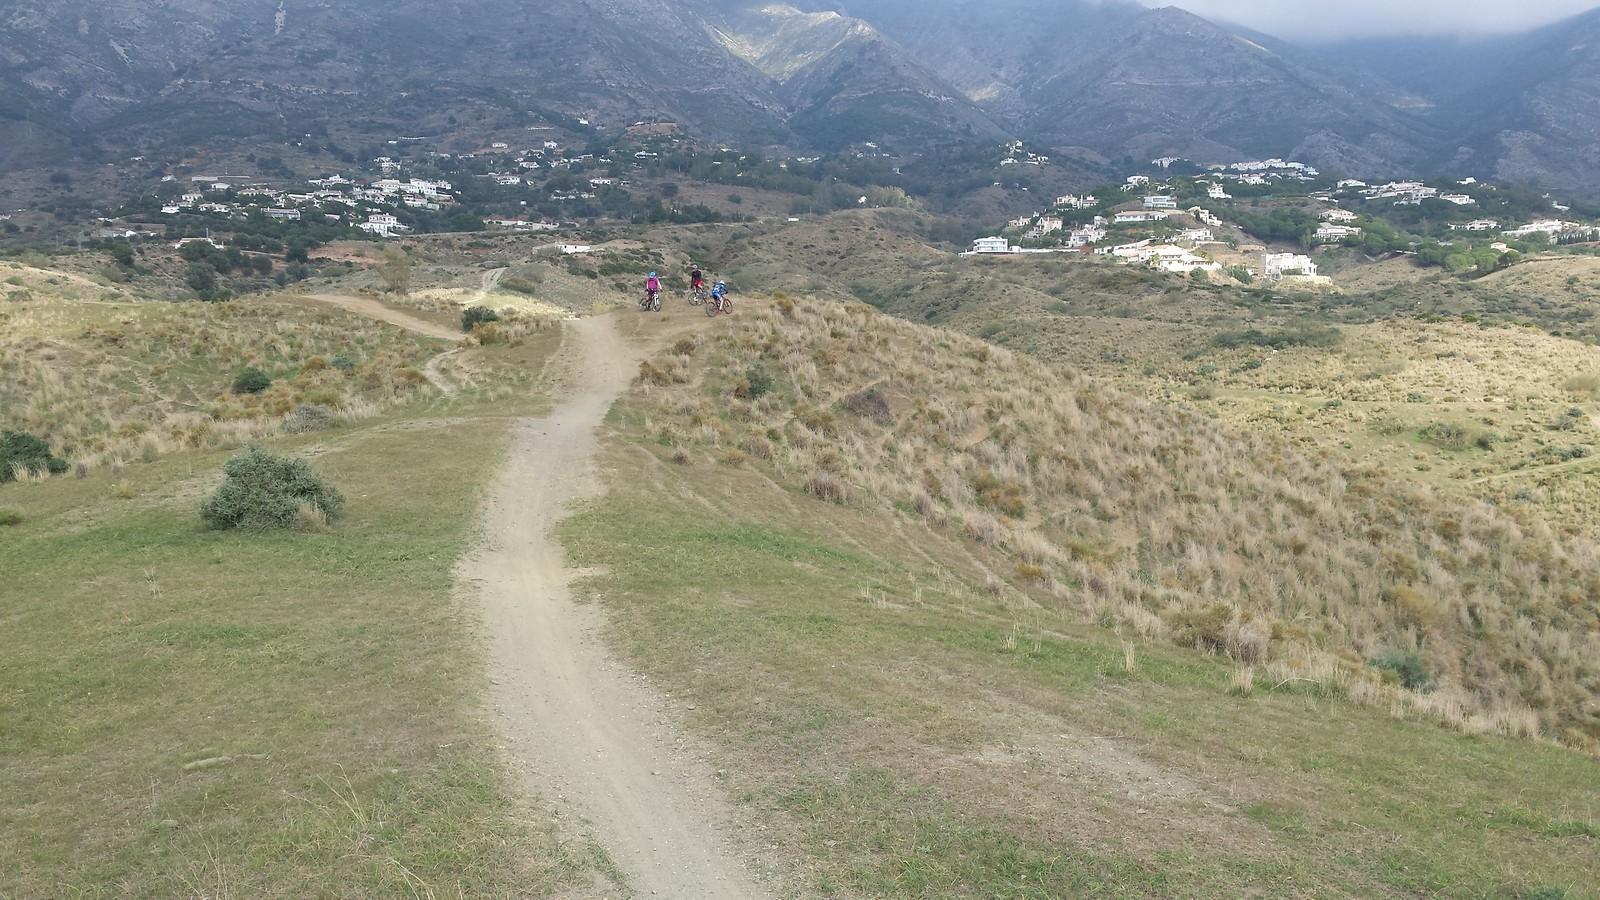 2015-12-26 14 09 52 - Sierramtb - Mountain Biking Pictures - Vital MTB